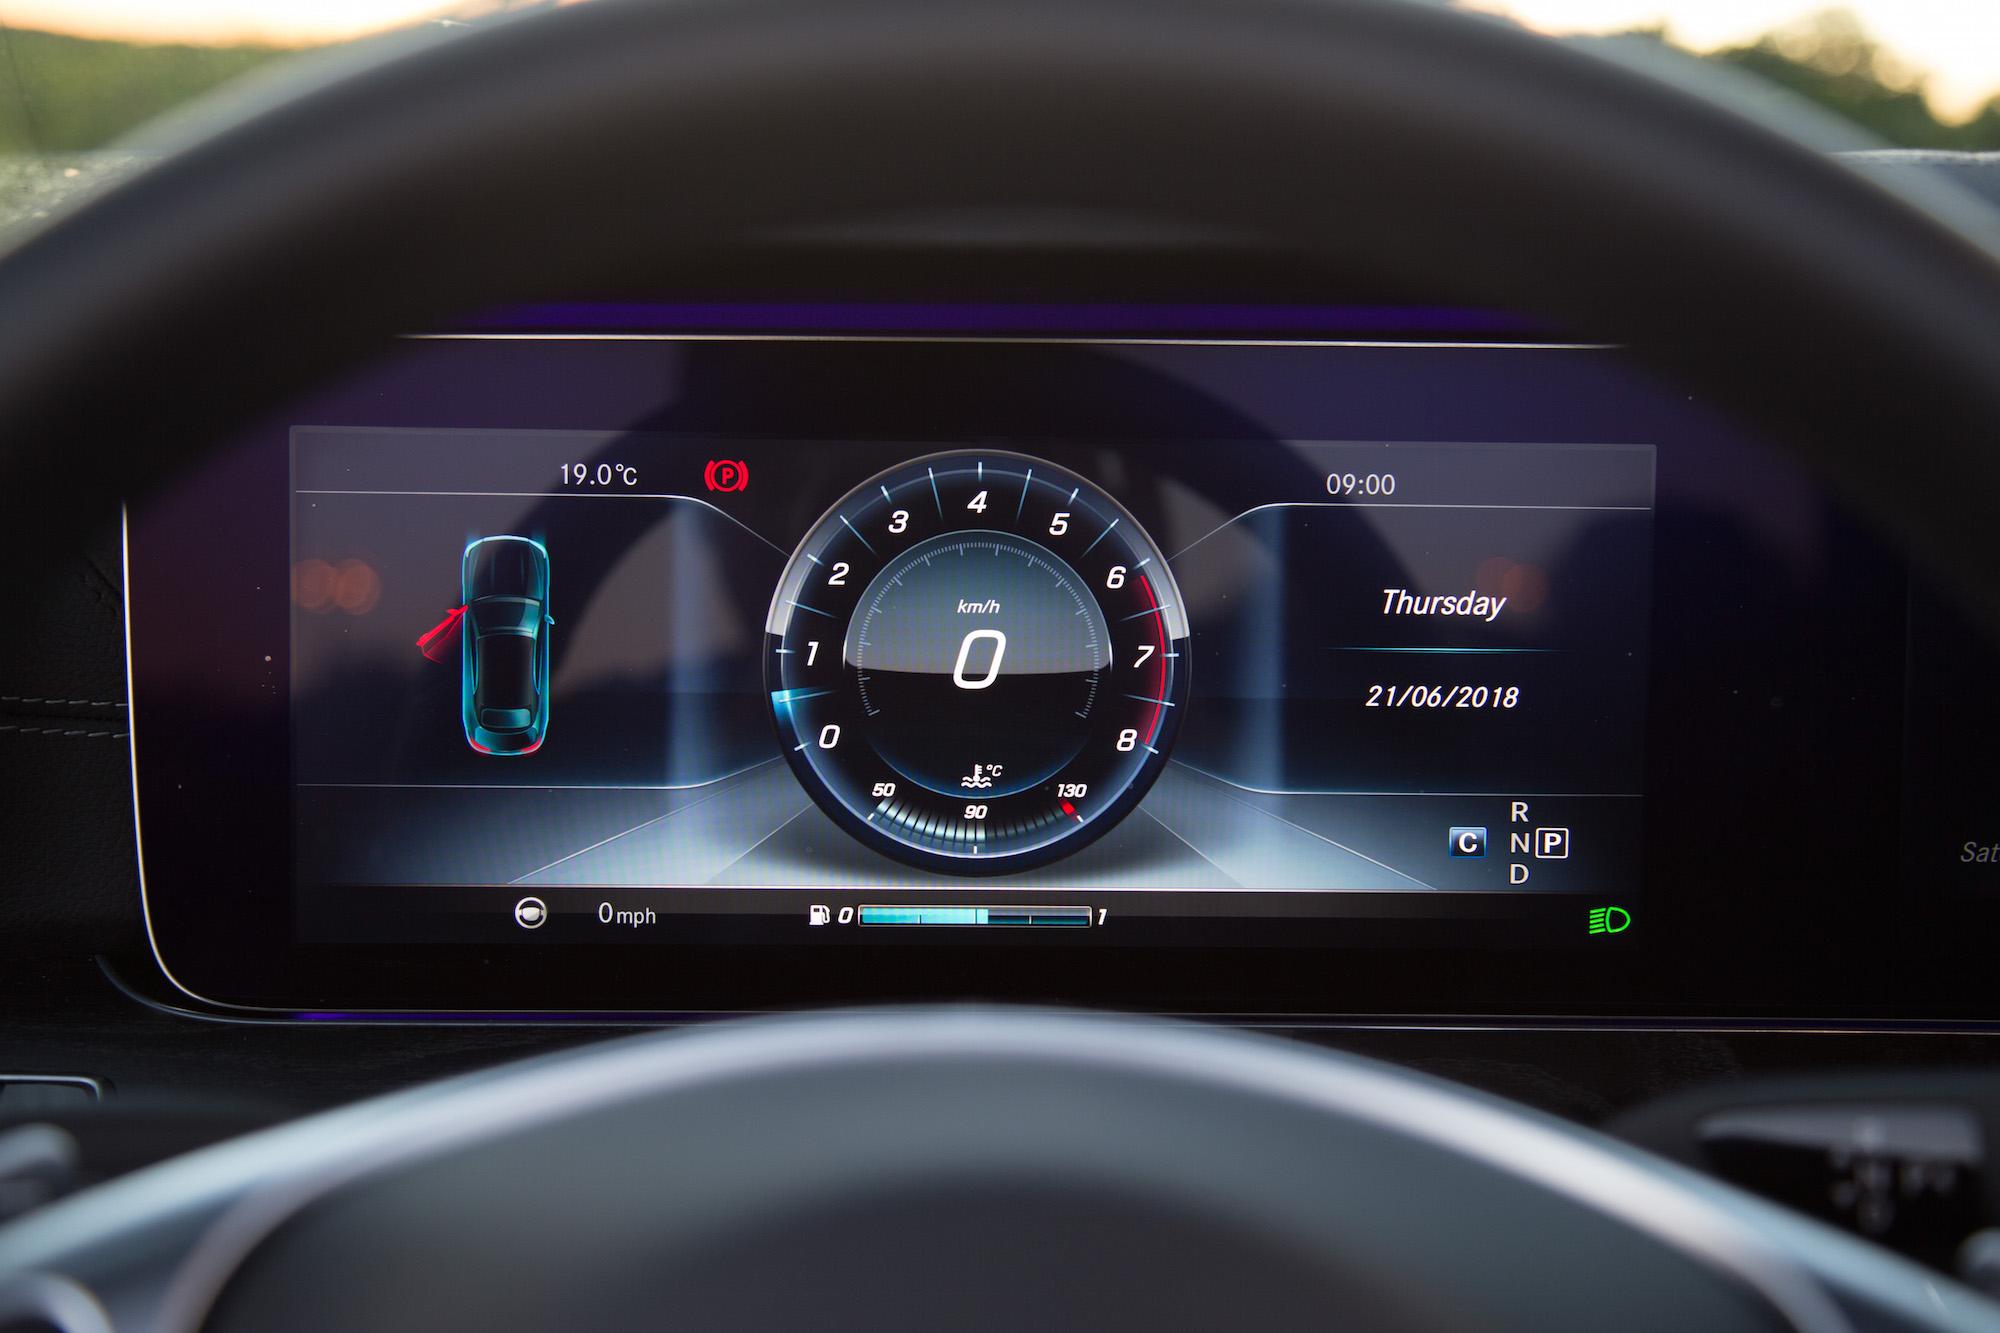 Mercedes E400 Convertible >> Review: 2018 Mercedes-Benz E 400 4MATIC Cabriolet   CAR